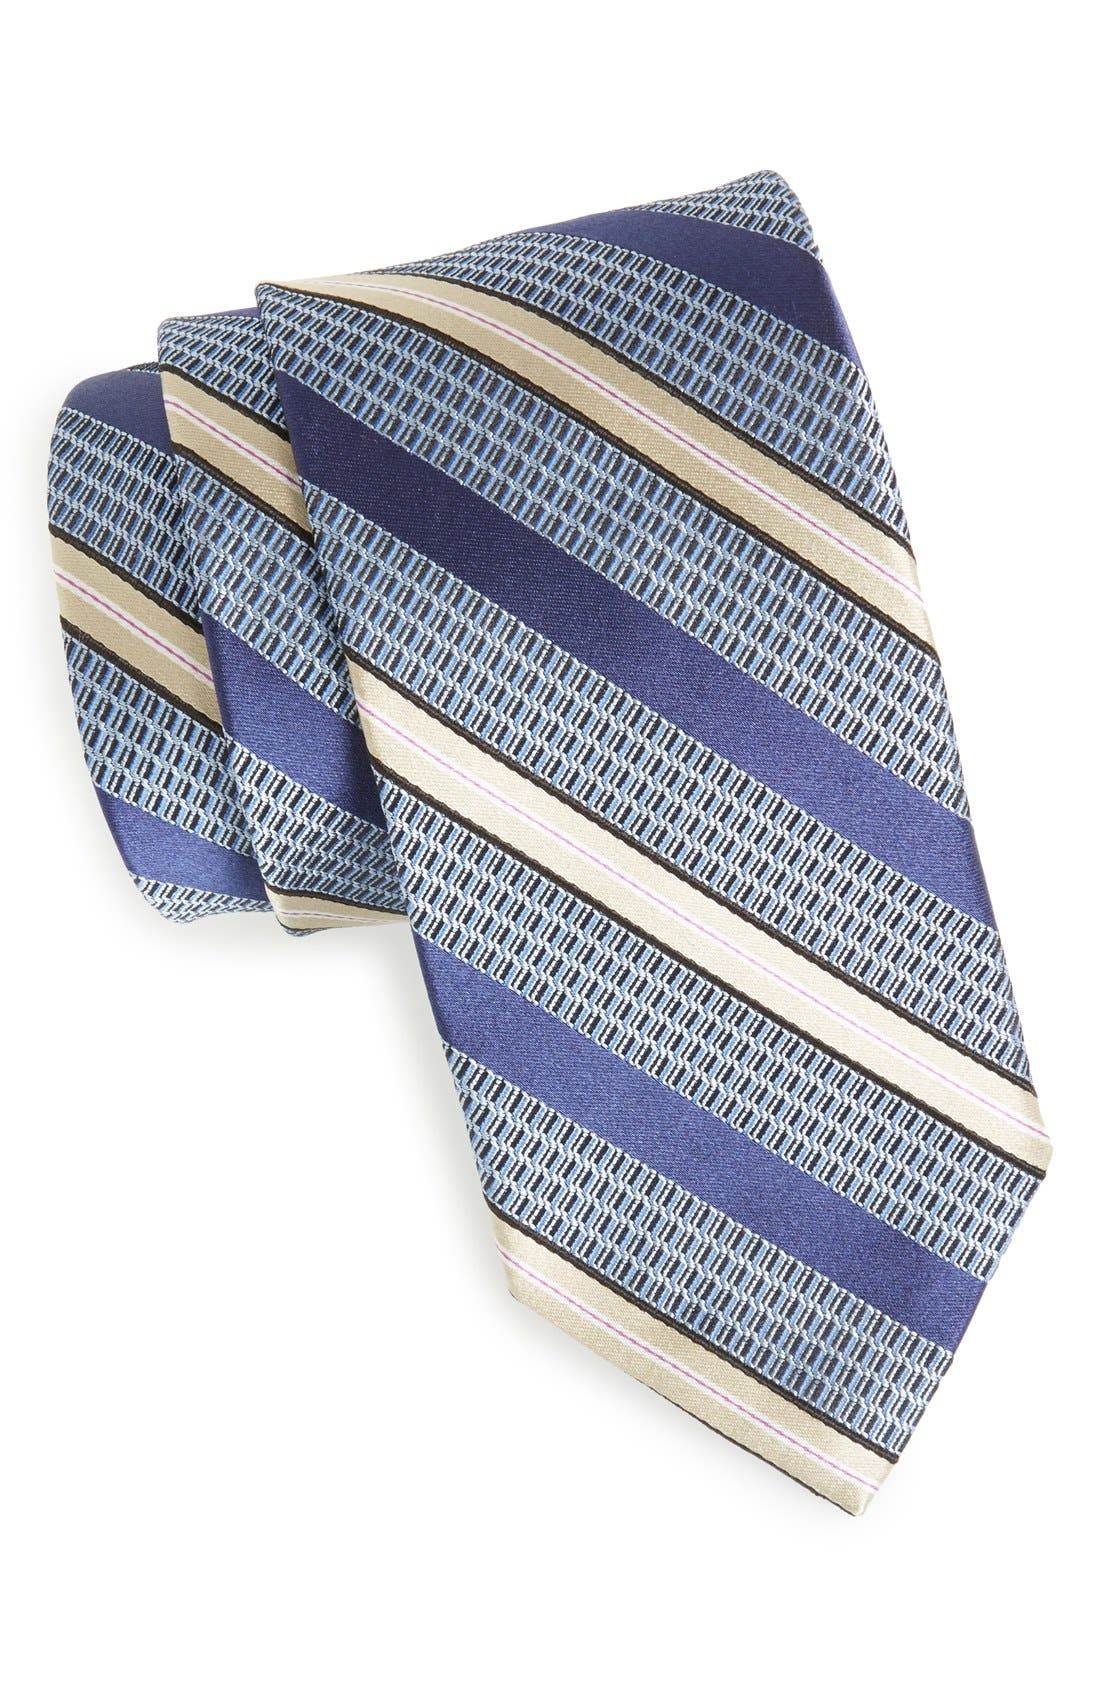 Woven Silk Tie,                             Main thumbnail 1, color,                             400